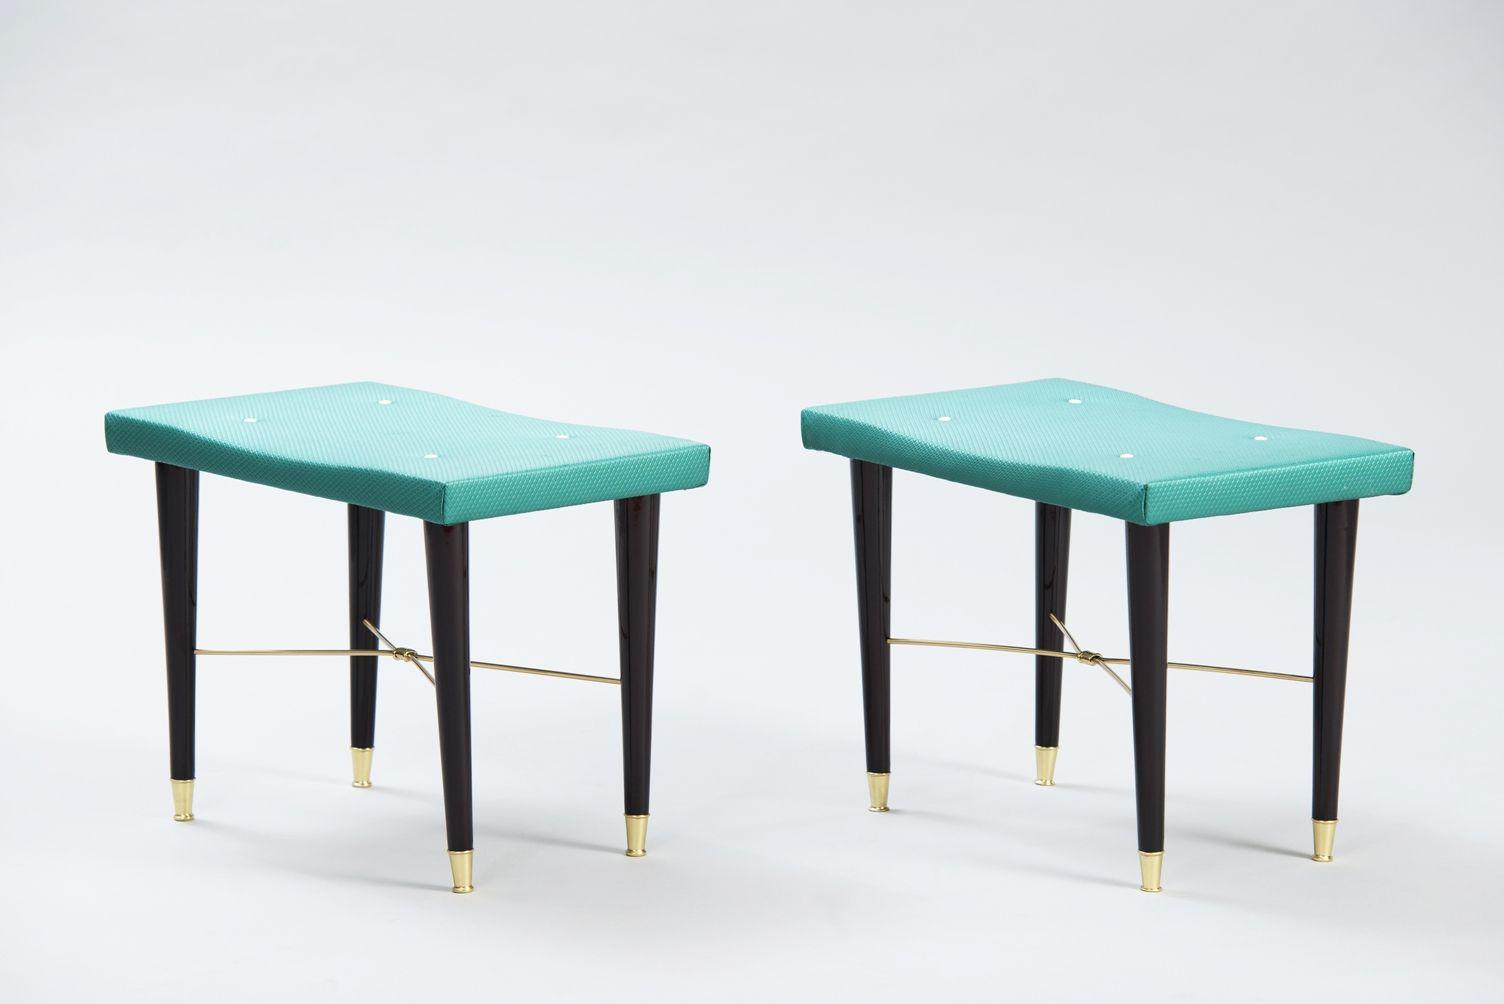 hocker aus dunklem holz und messing 2er set bei pamono kaufen. Black Bedroom Furniture Sets. Home Design Ideas